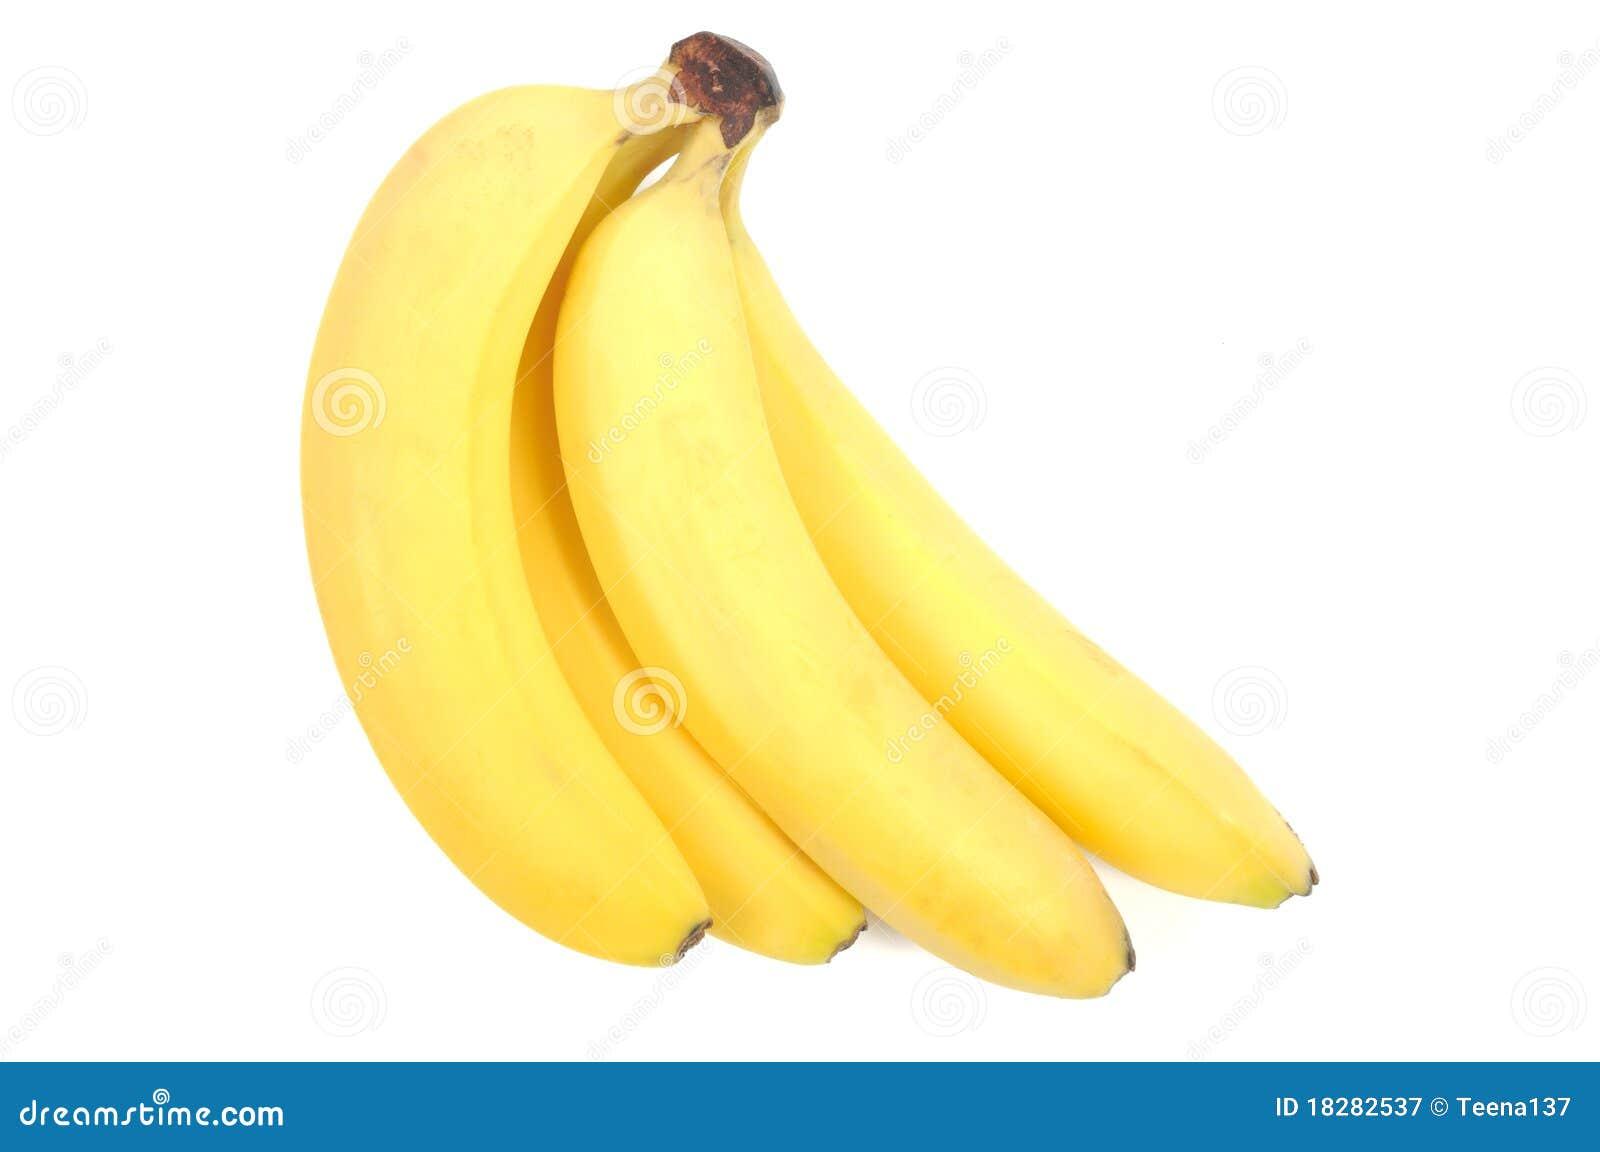 Bananas Royalty Free Stock Photography - Image: 18282537